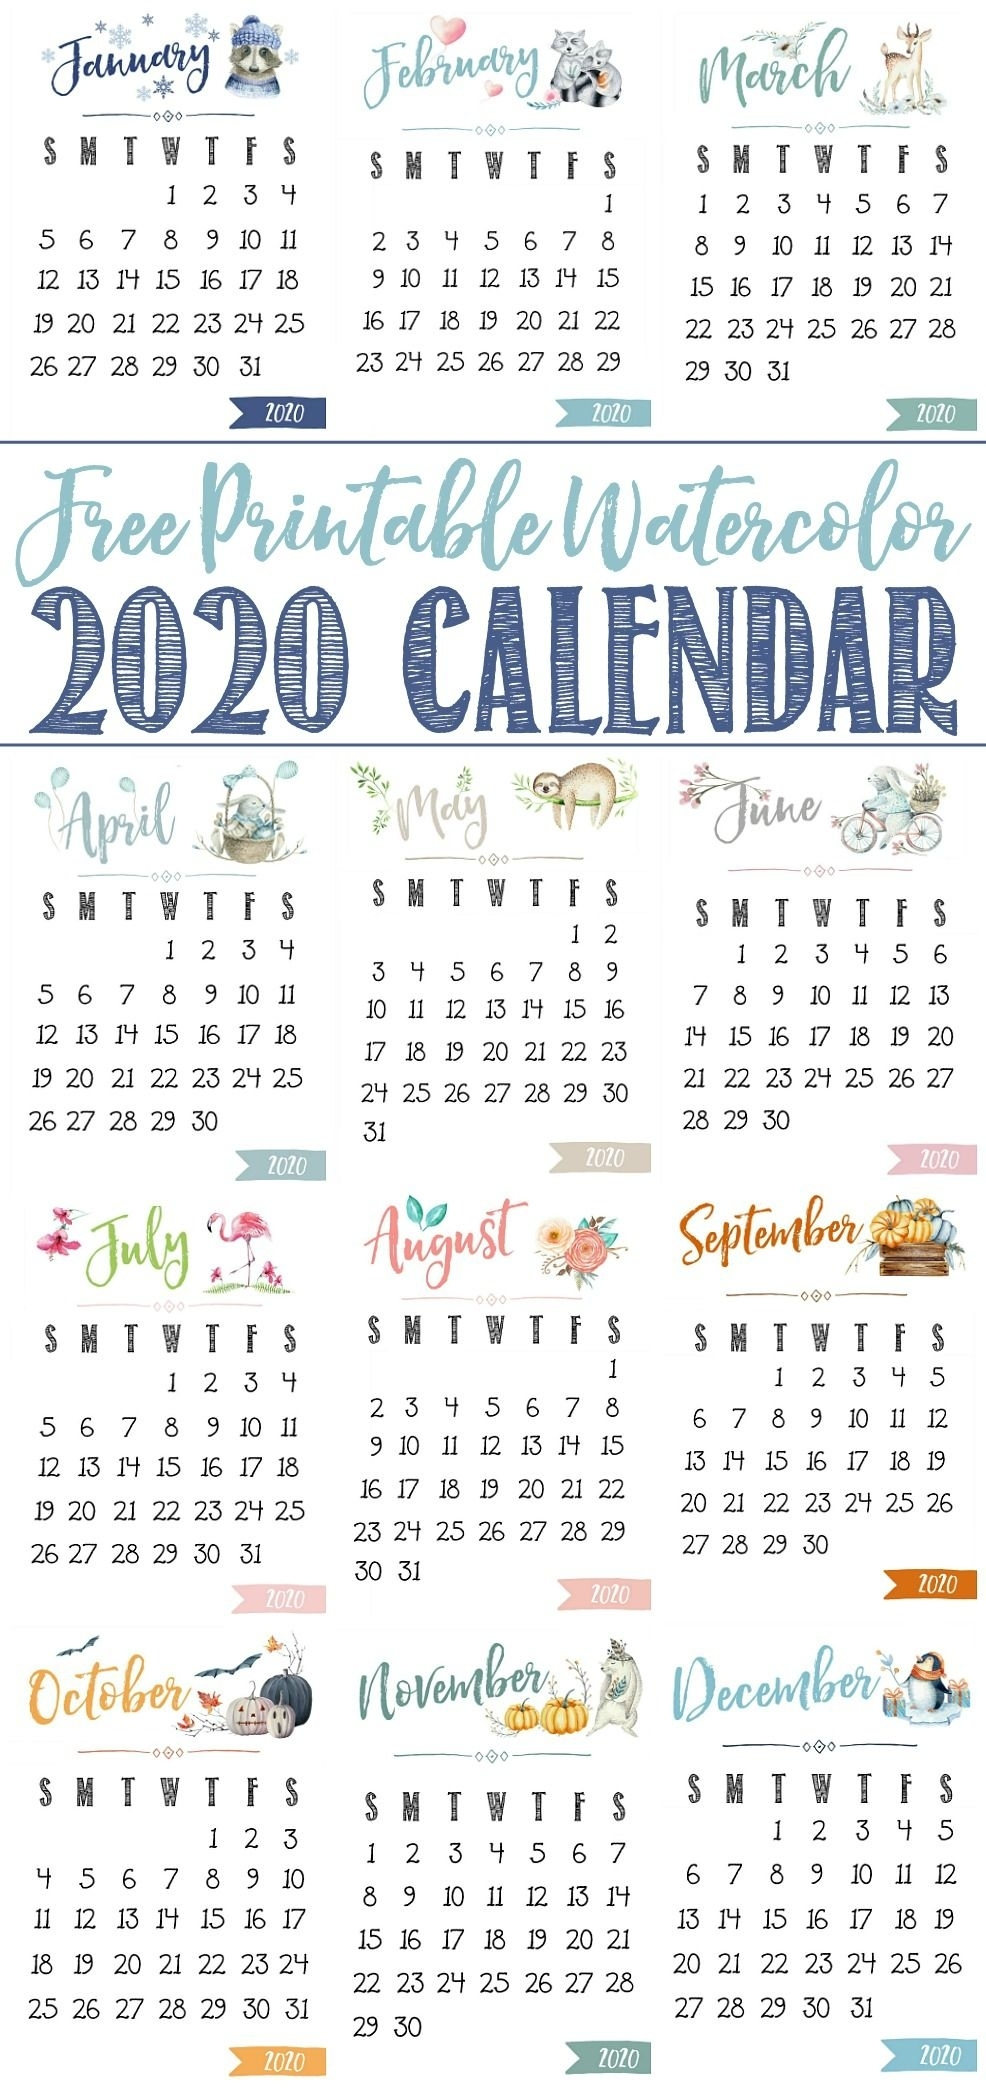 Free Printable 2020 Calendar   Free Printable Calendar, Free